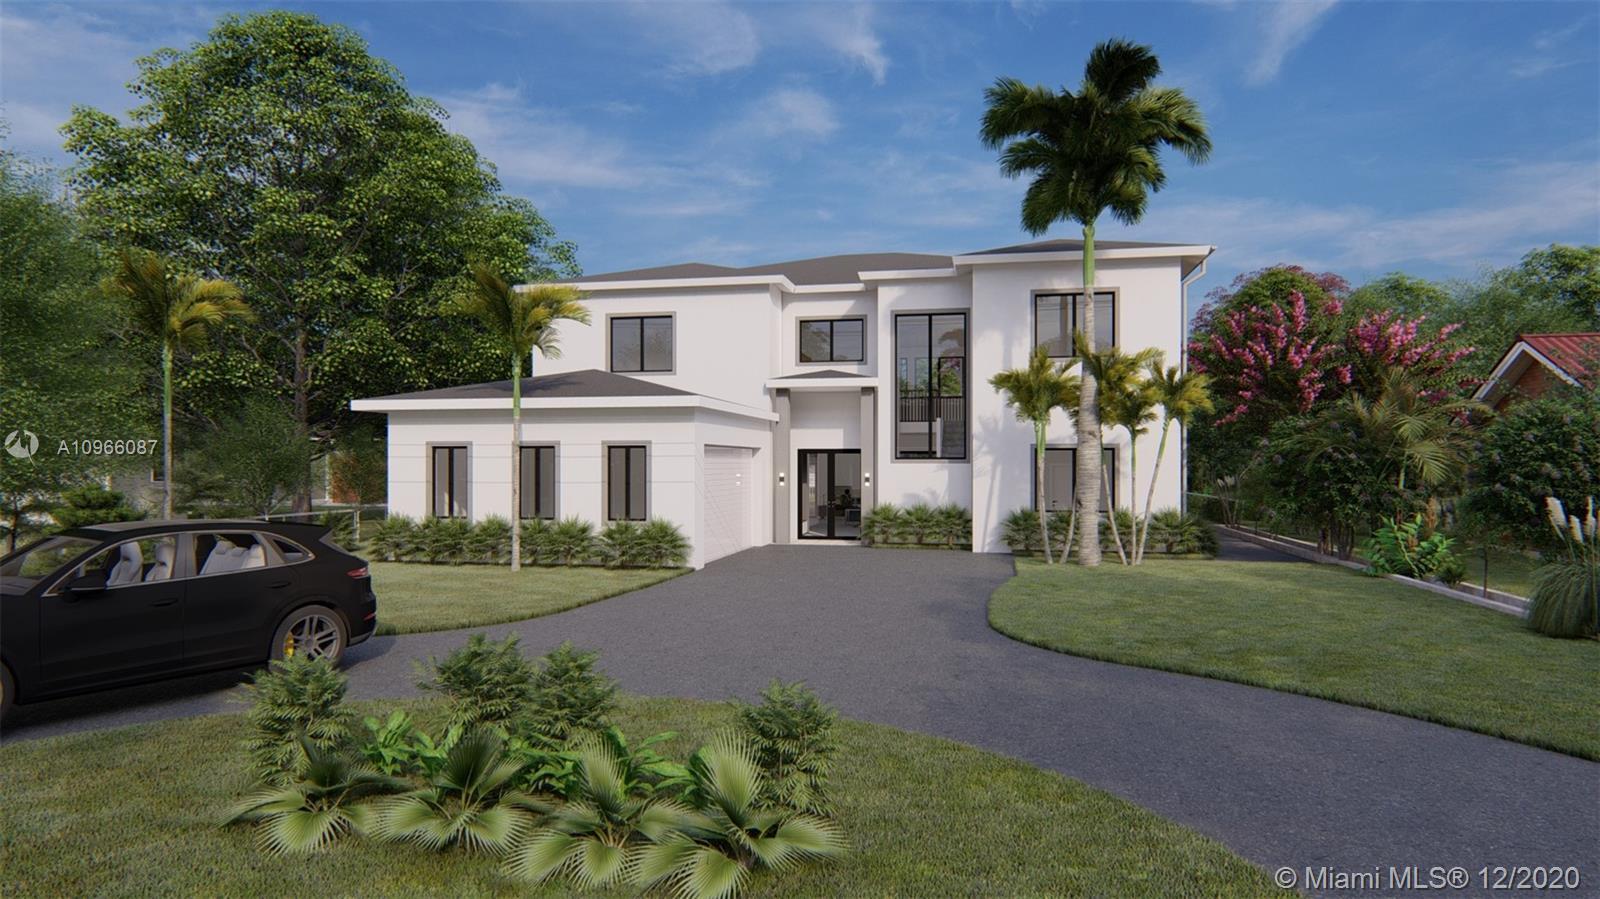 1106 118th St, Biscayne Park, Florida 33161